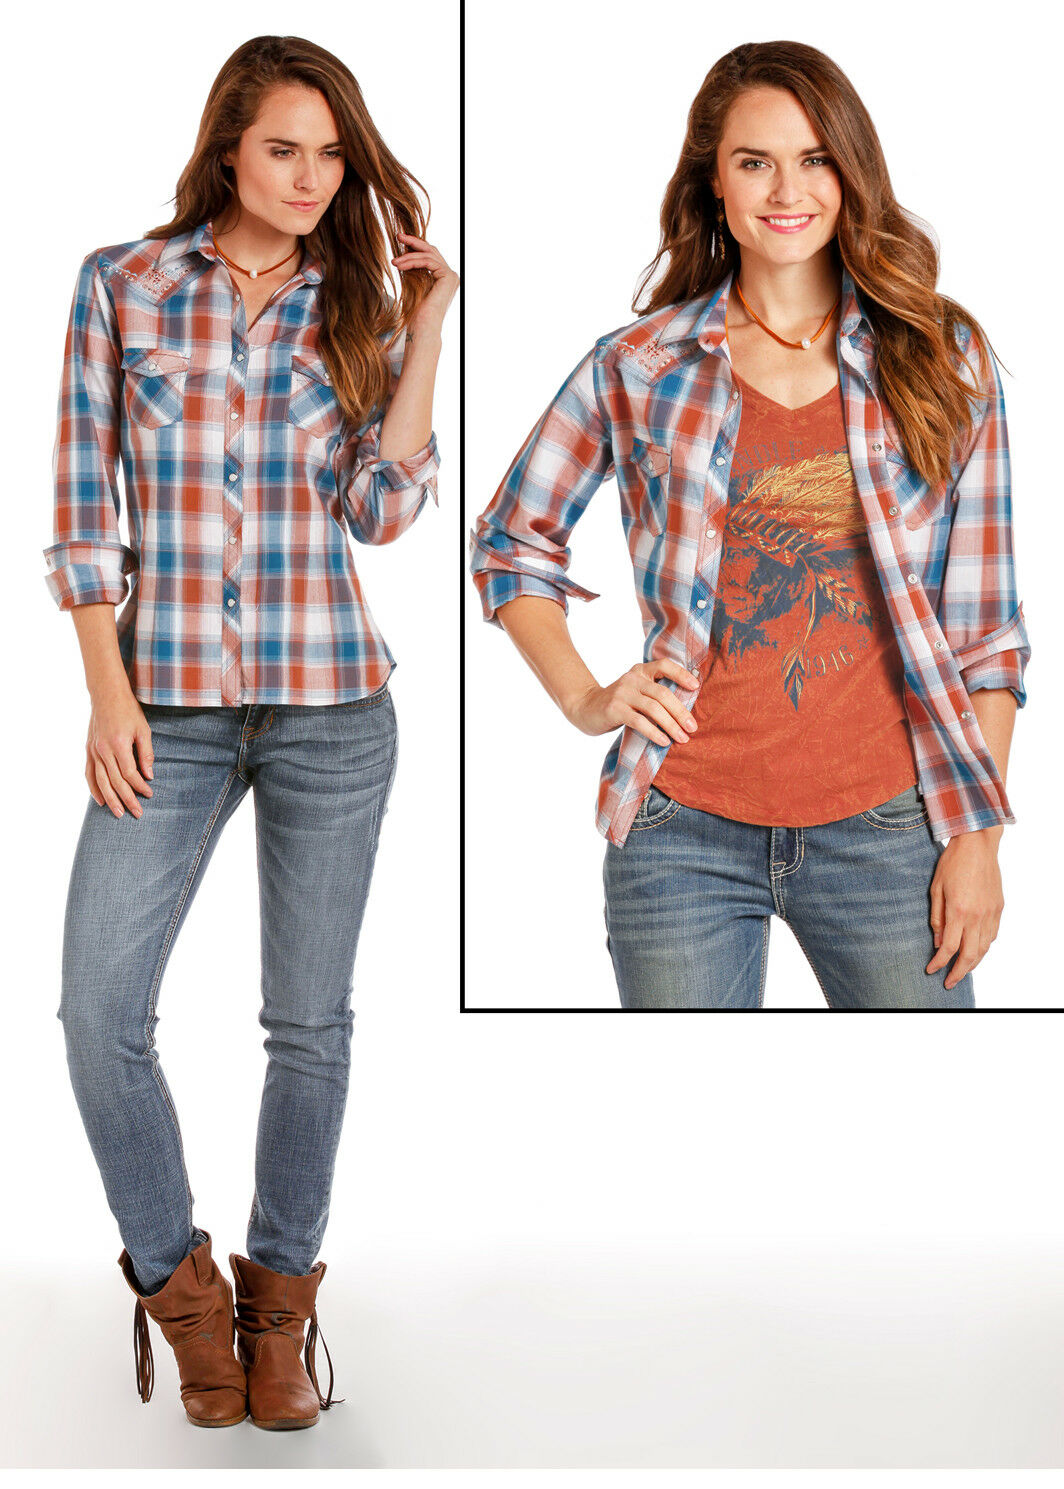 Panhandle Slim Blau & Burnt Orange Plaid Snap Up Western Shirt 22S5854 22X5854